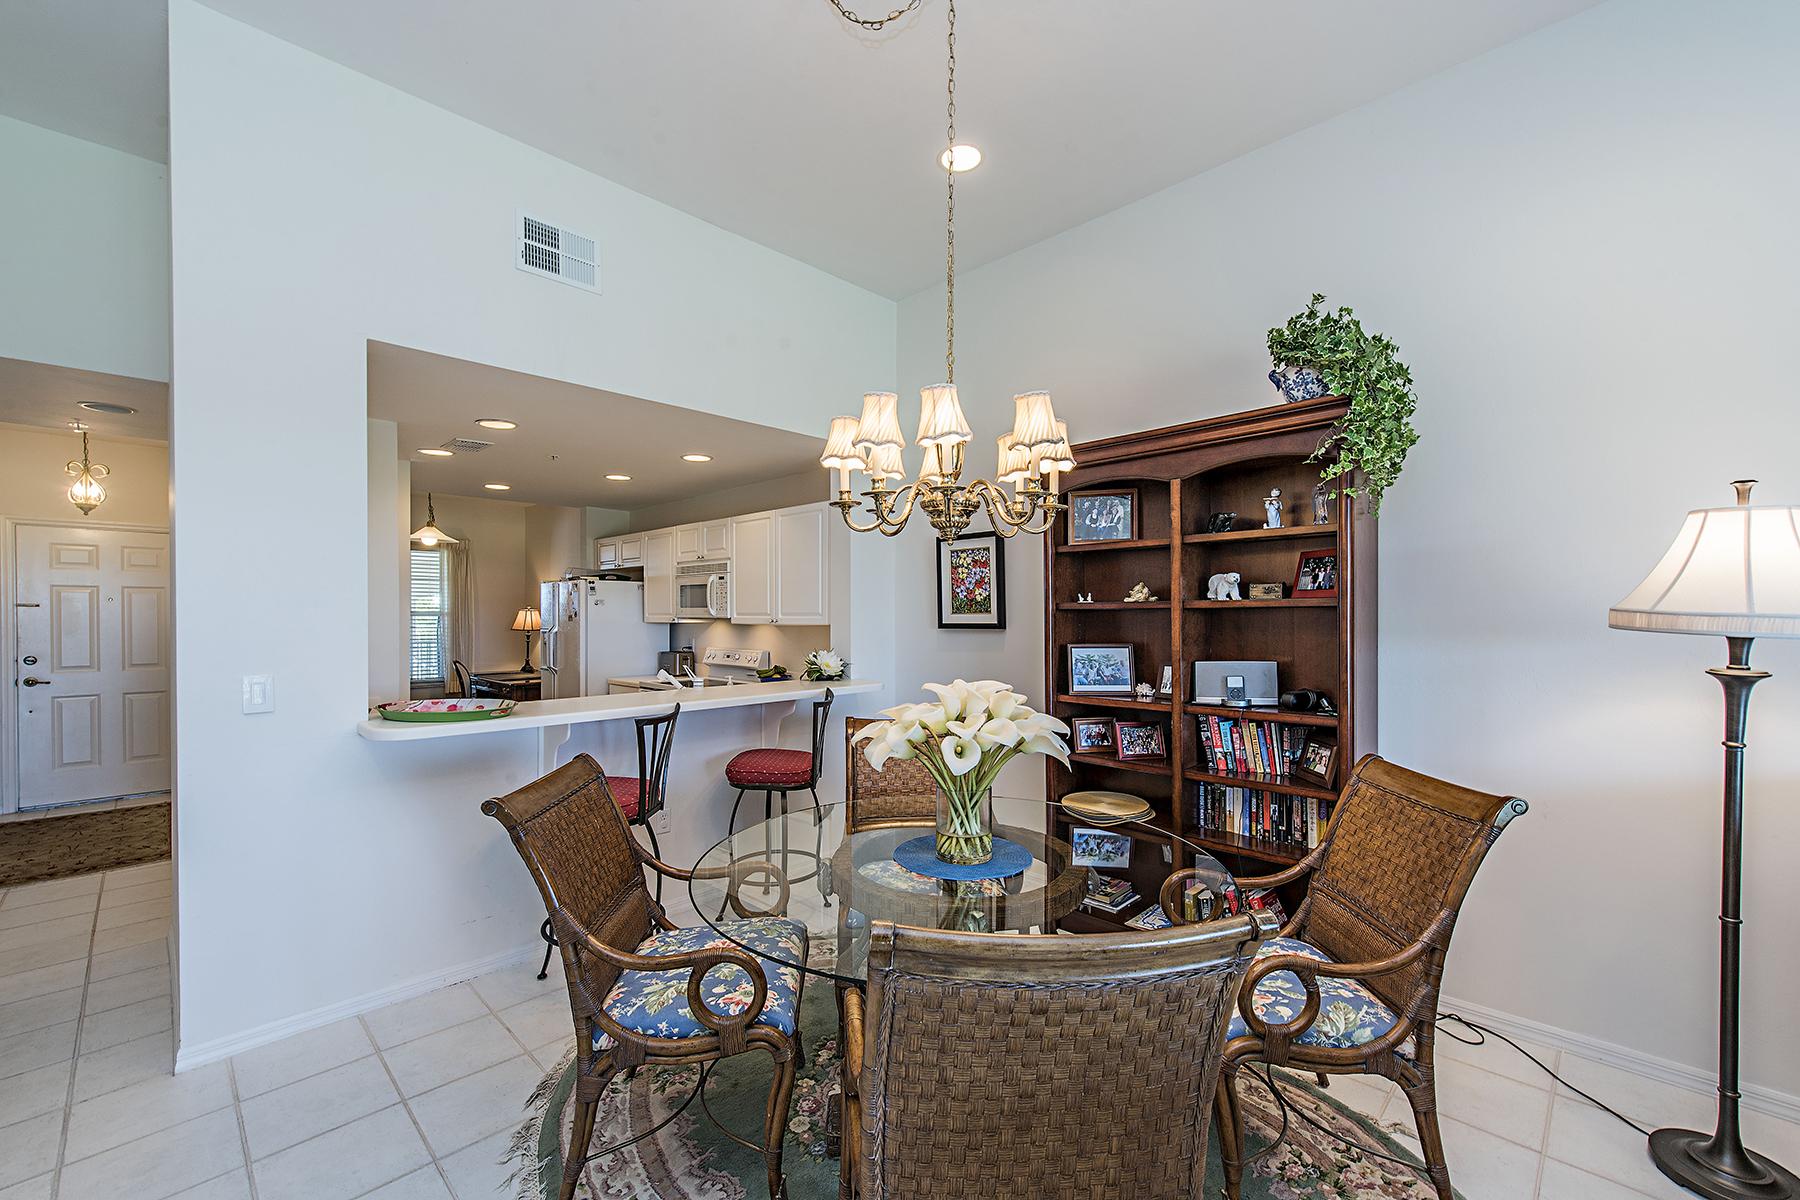 Additional photo for property listing at BONITA BAY - GREENBRIAR 4120  Bayhead Dr 302,  Bonita Springs, Florida 34134 United States